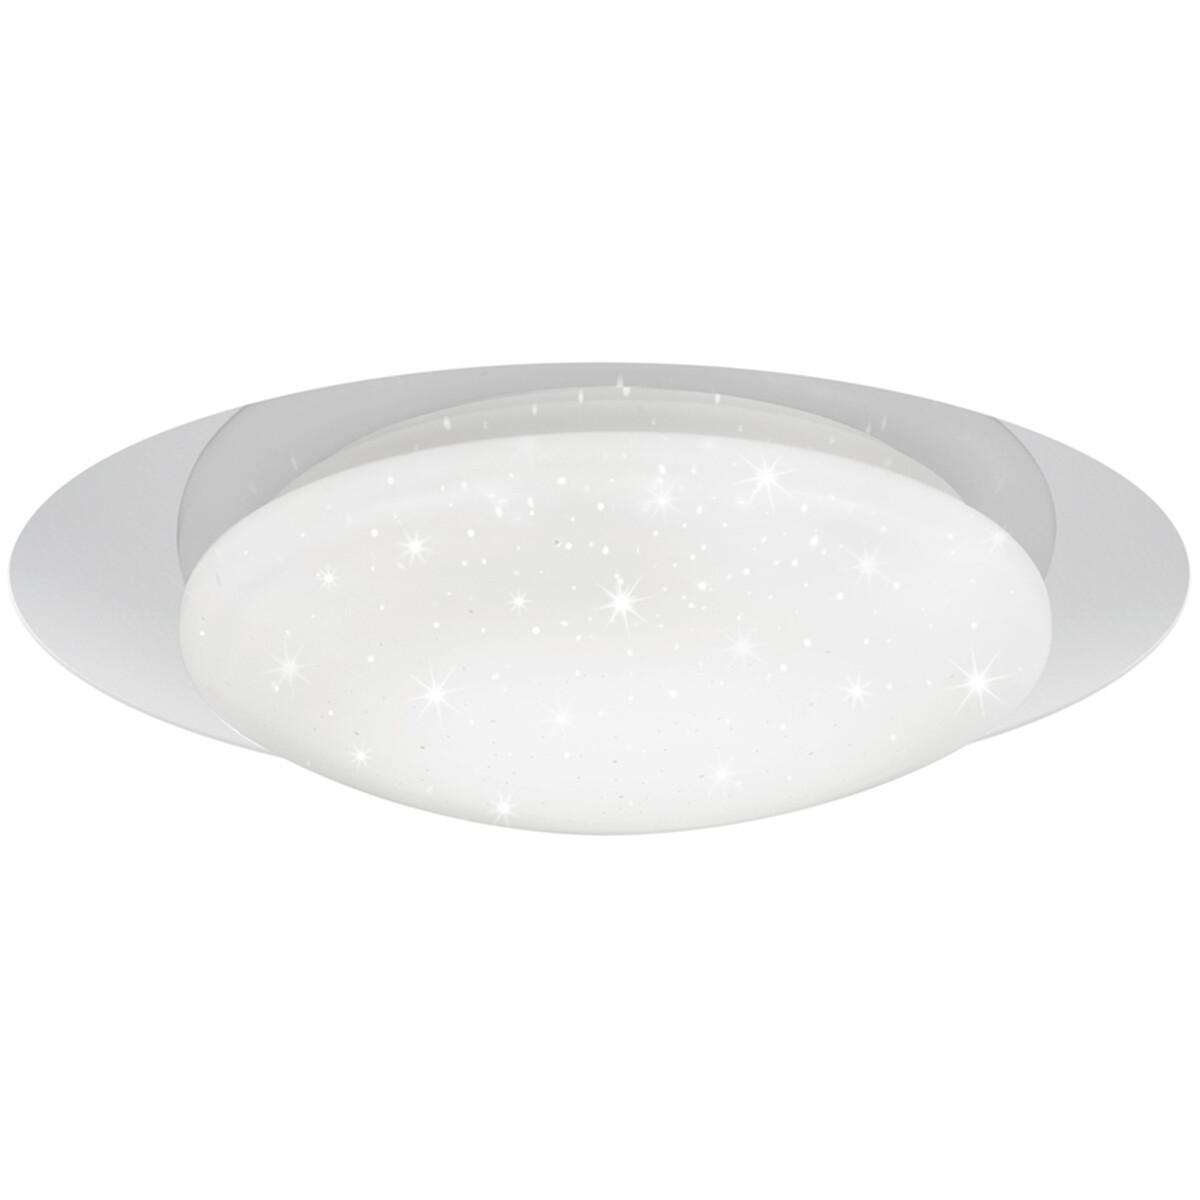 LED Plafondlamp - Plafondverlichting - Trion Frida - 13W - Aanpasbare Kleur - Dimbaar - Rond - Mat W